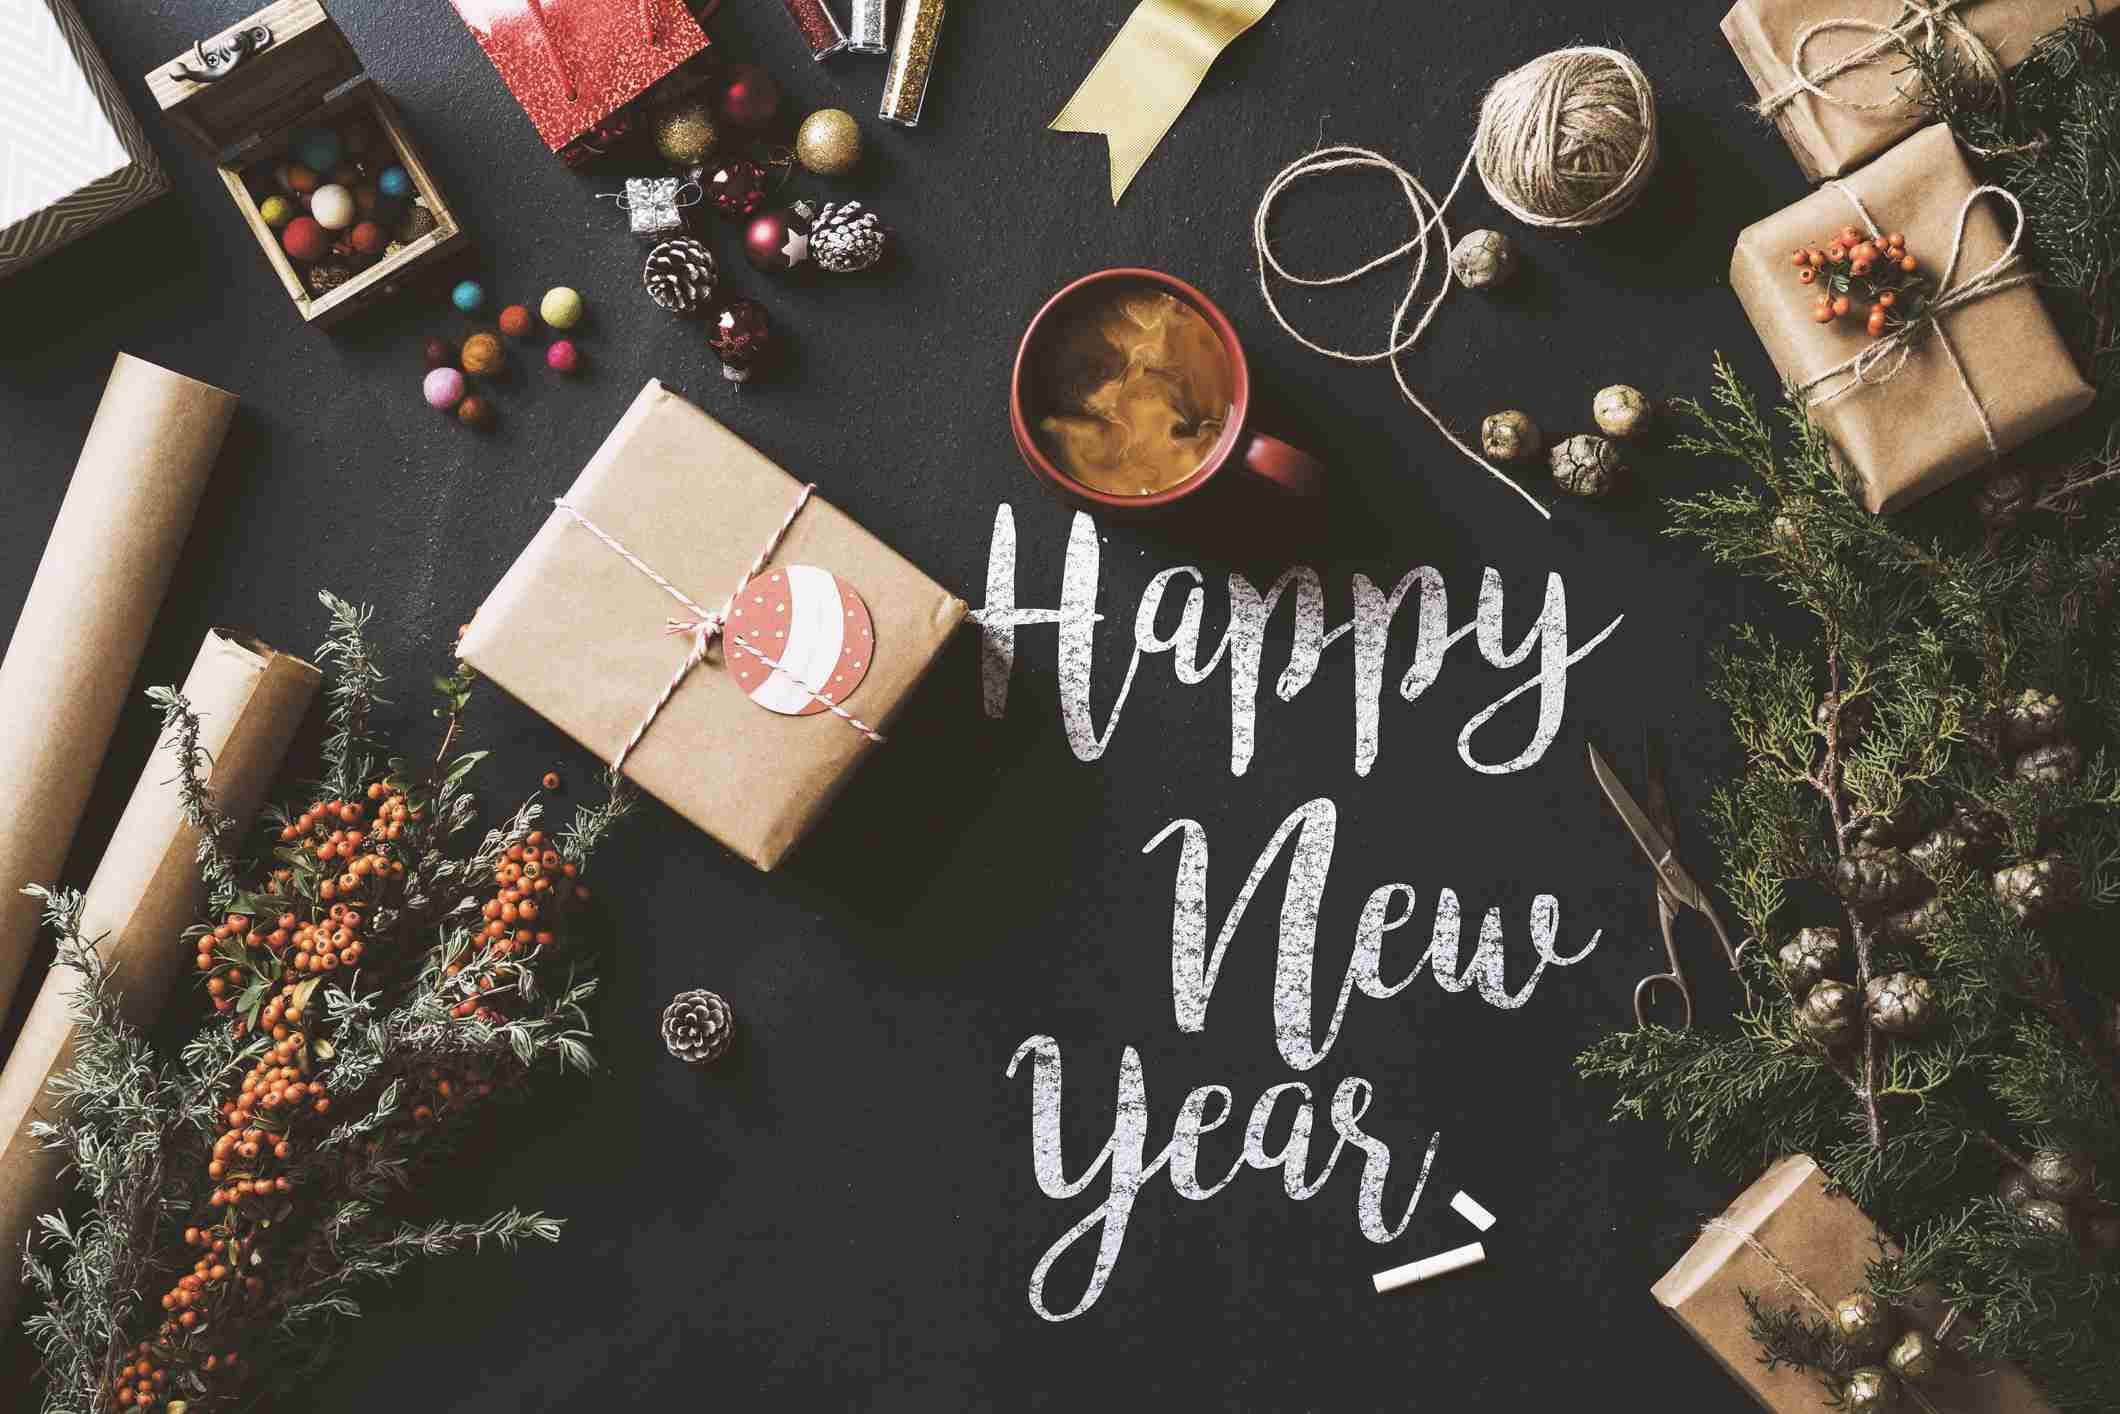 Calligraphy Happy New Year 2017 chalk written blackboard, flat lay